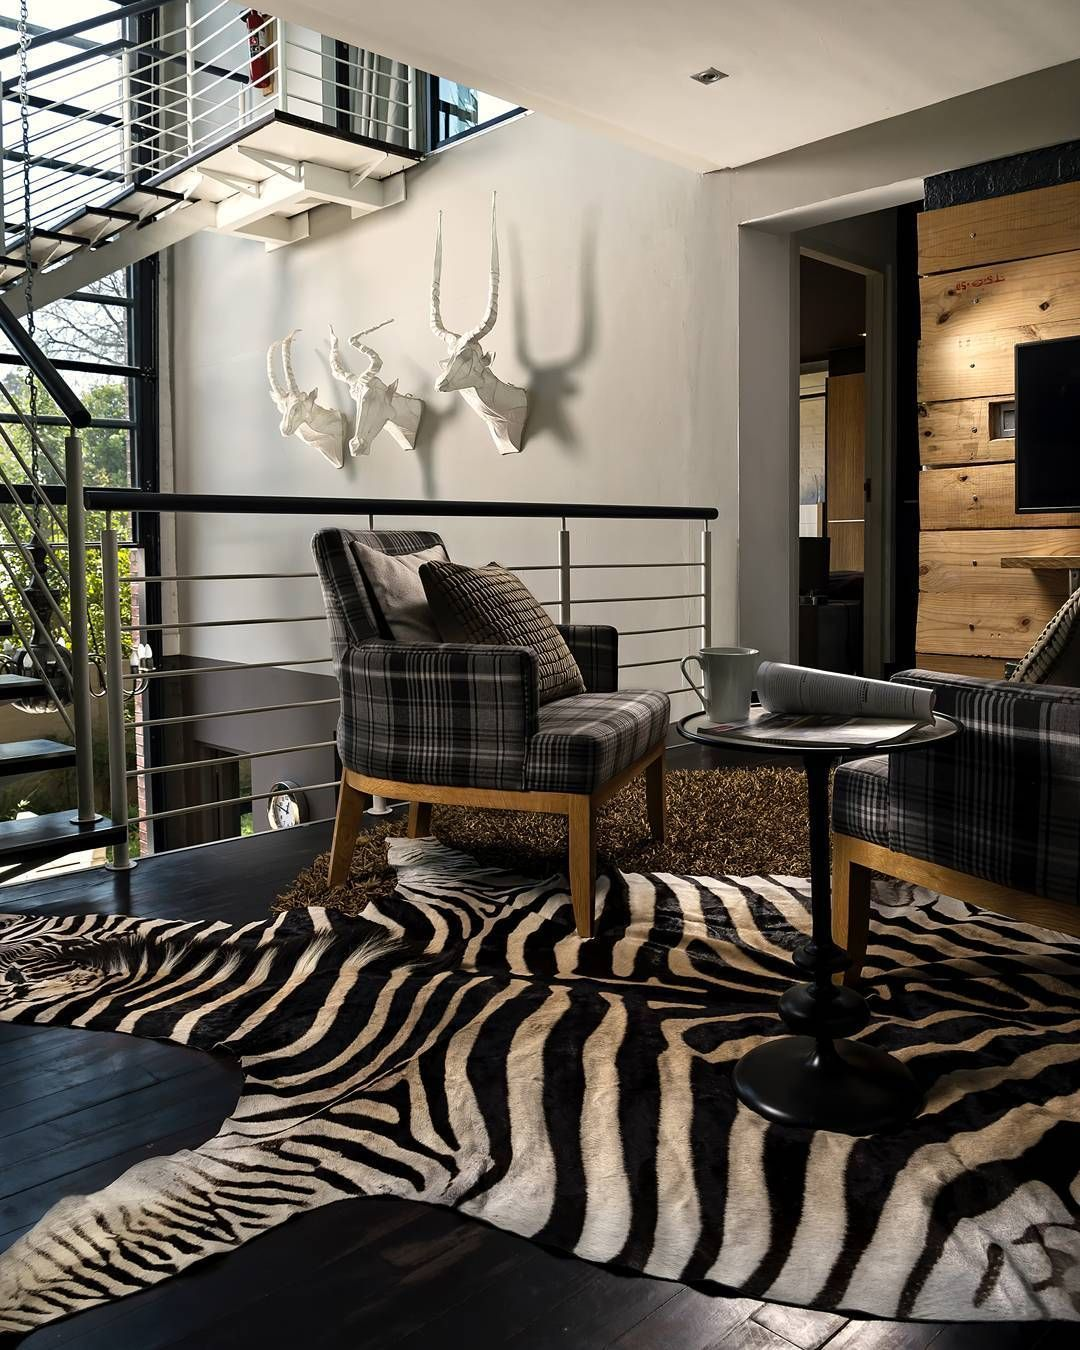 Animal Skin Living Room Zebra Zebra Decor African Home Decor Interior Living room ideas zebra